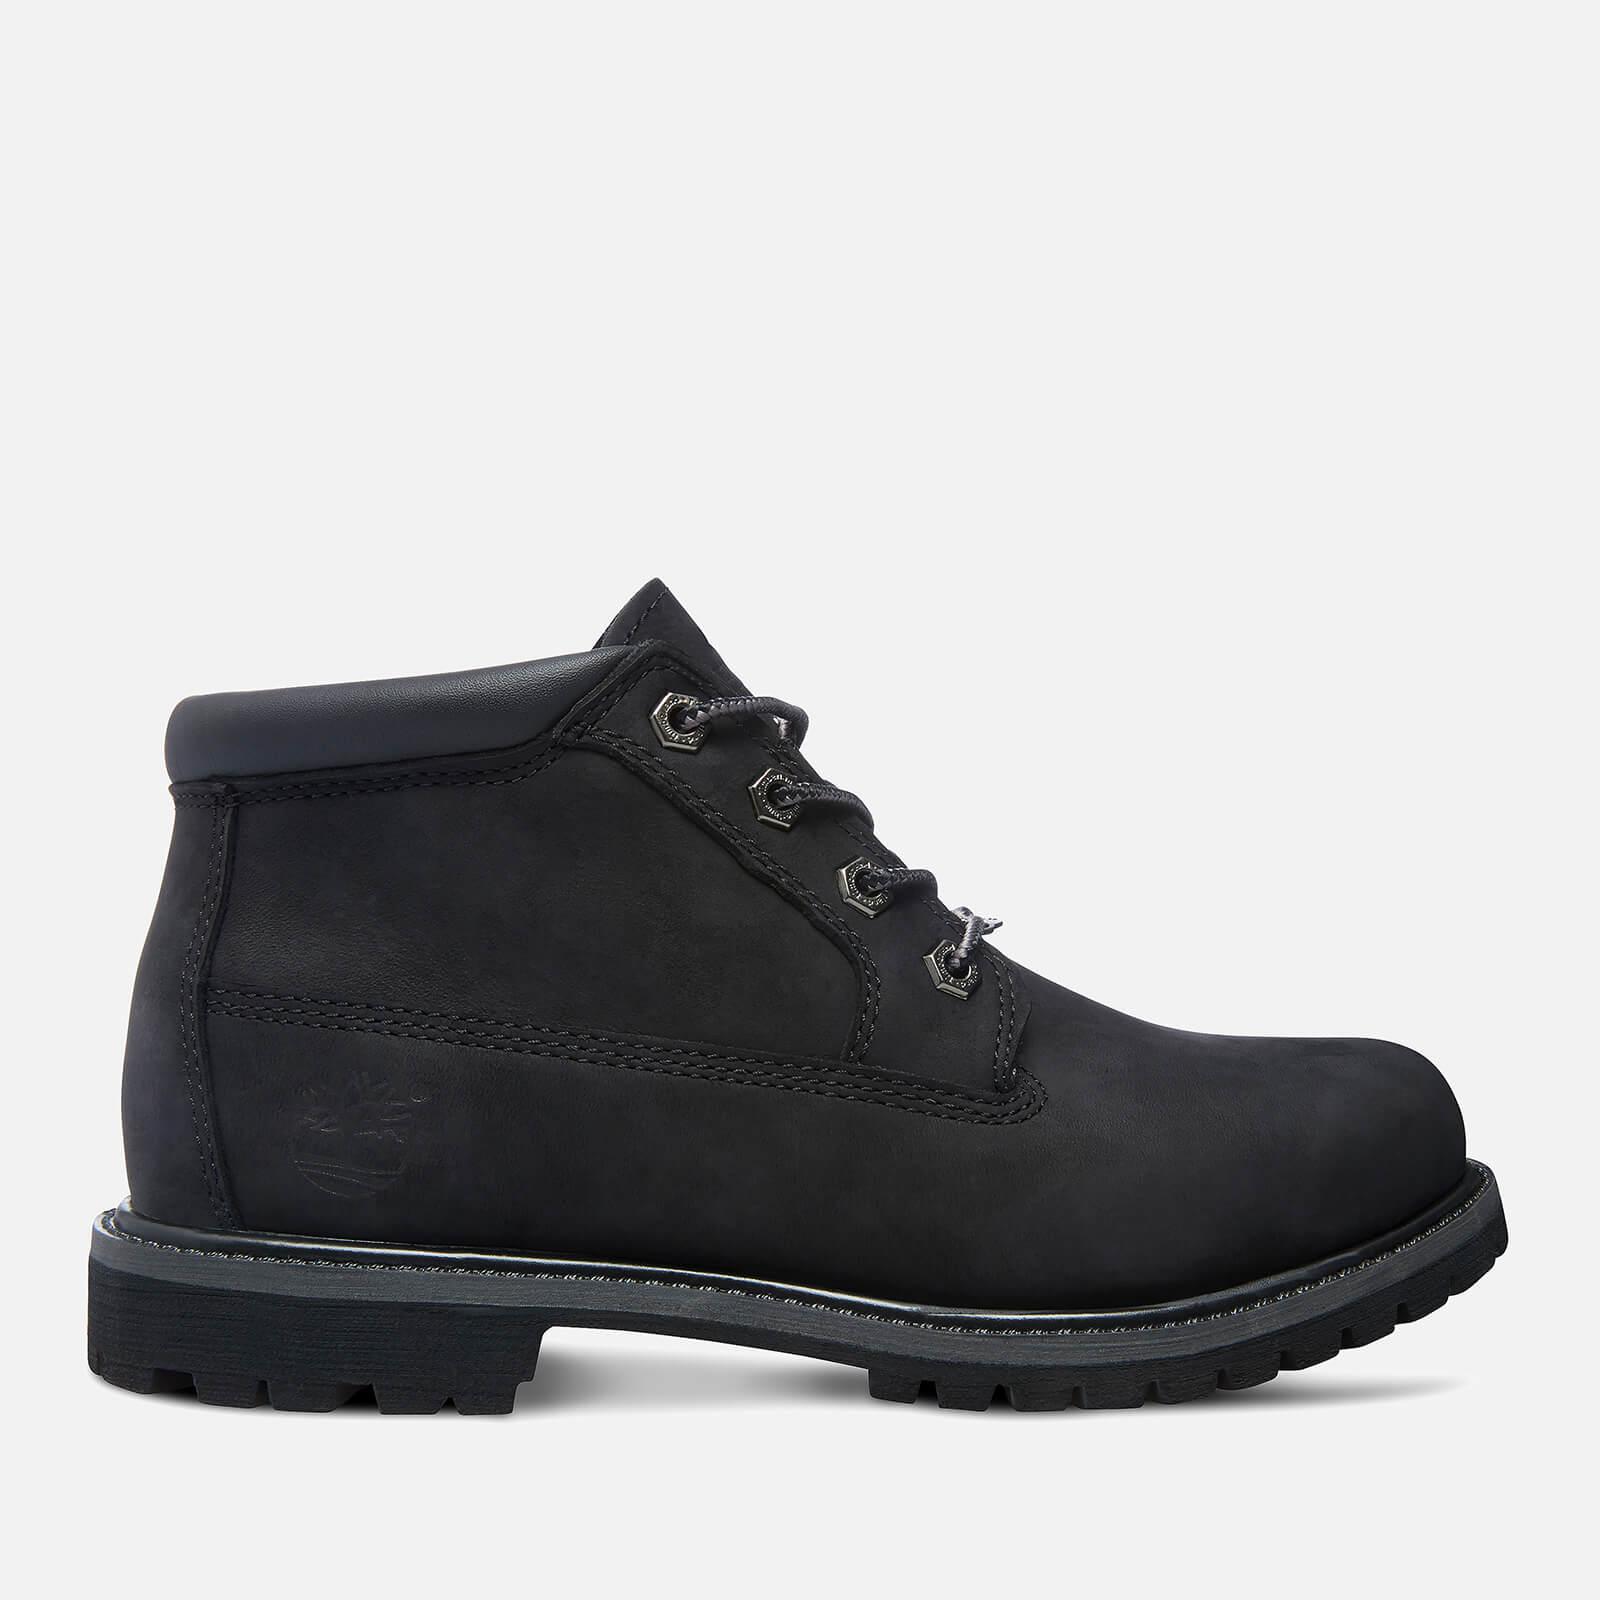 Timberland Women's Nellie Double Leather Chukka Boots - Black - UK 6